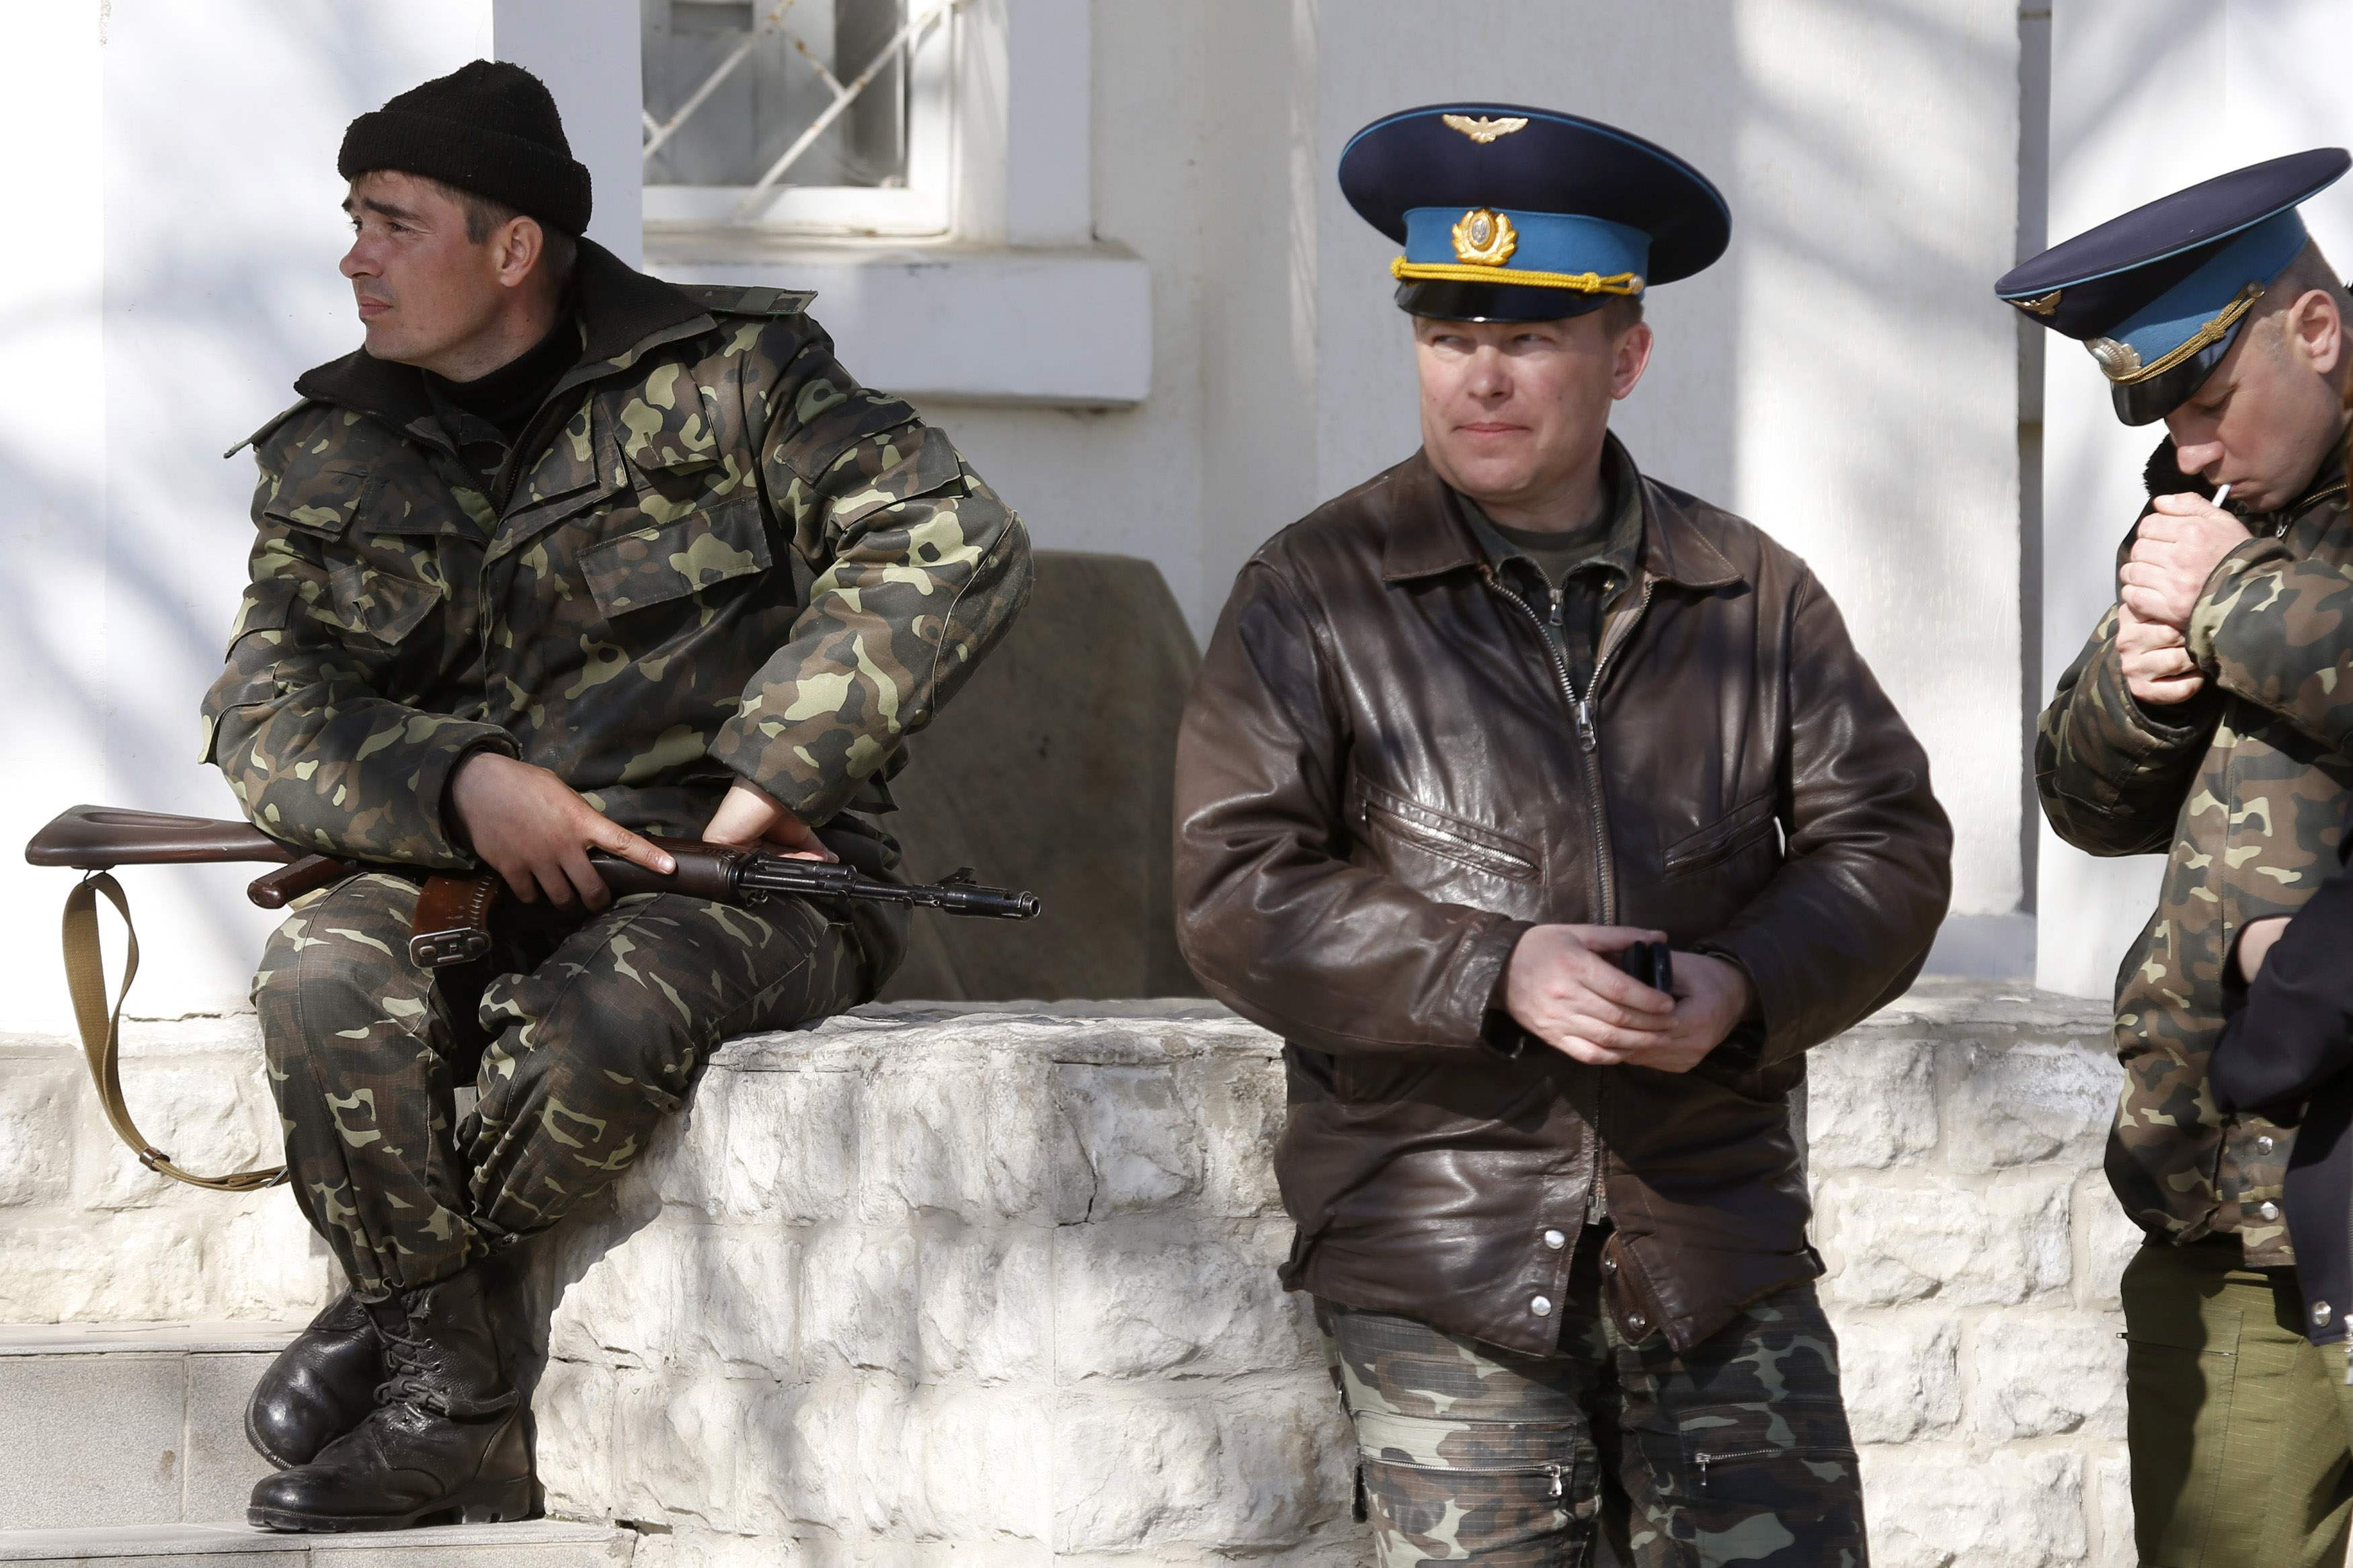 Юлий Мамчур не освобожден оккупантами